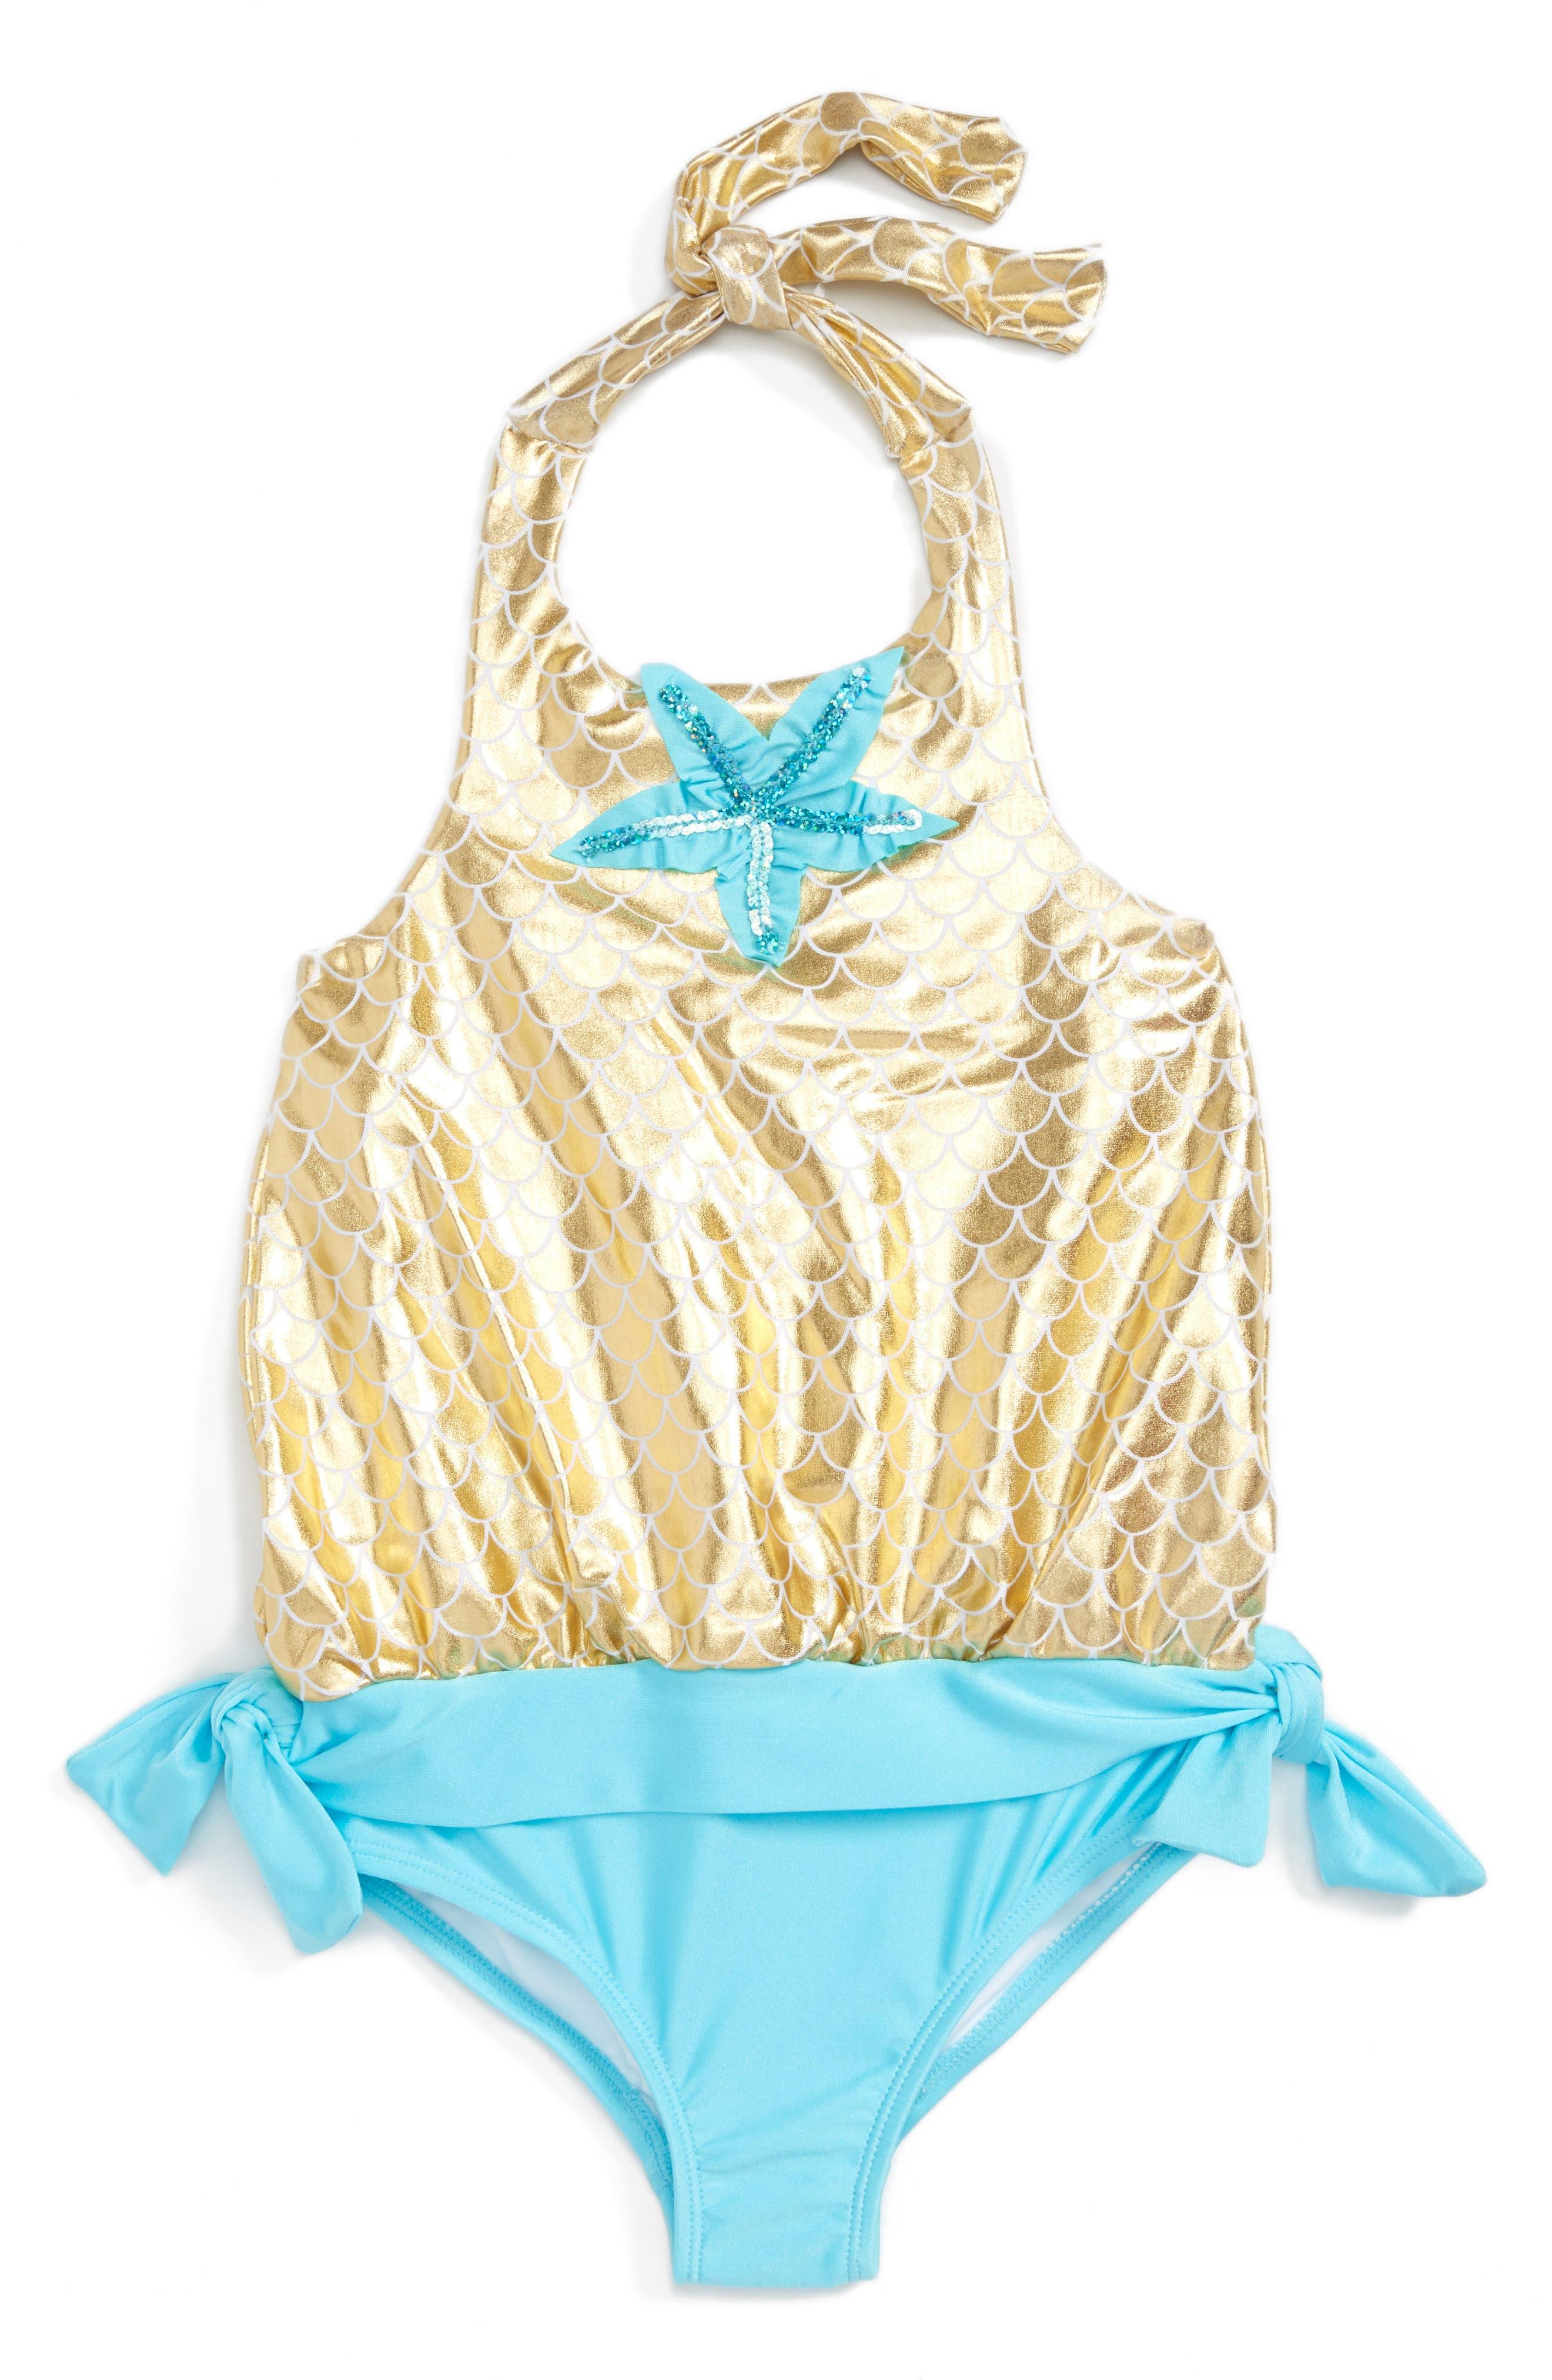 Alternate Image 1 Selected - Love U Lots Starfish One-Piece Swimsuit (Toddler Girls & Little Girls)